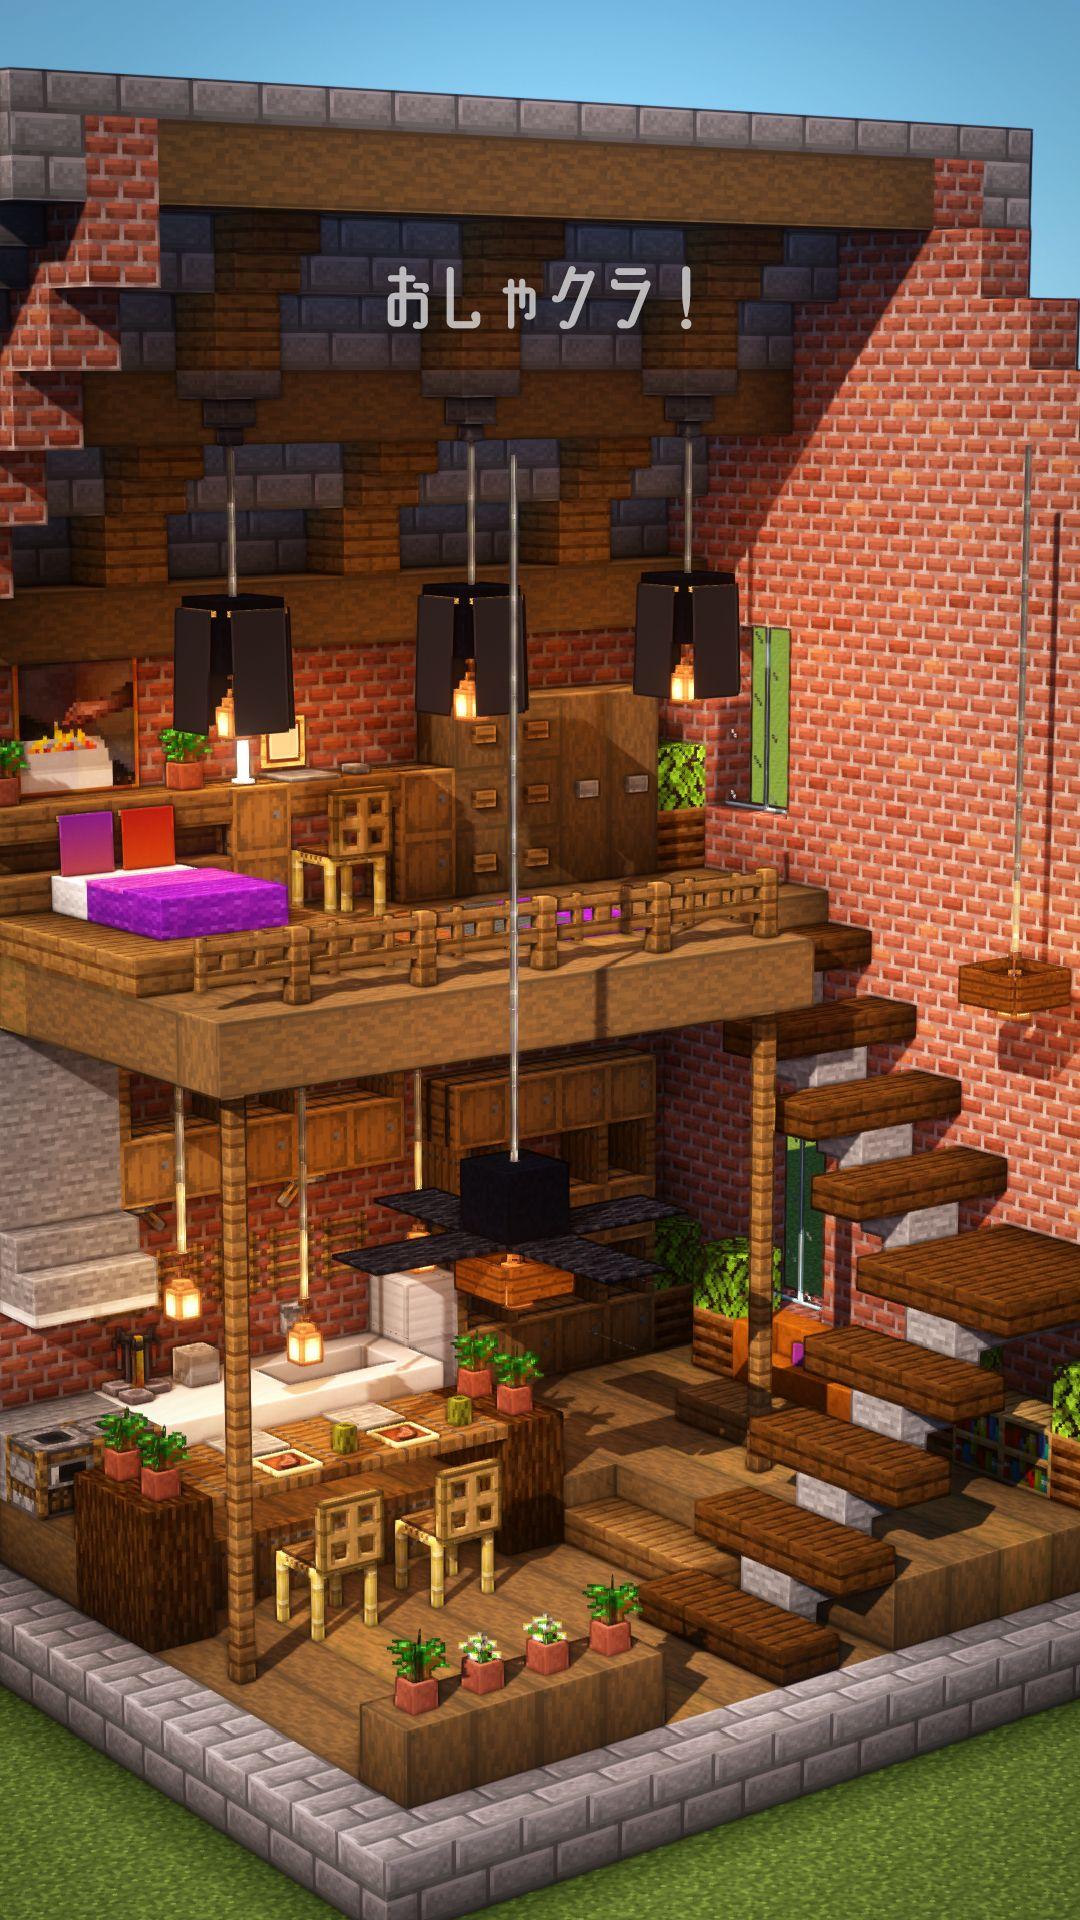 Minecraft Building Oshacra おしゃクラ In 2020 Minecraft